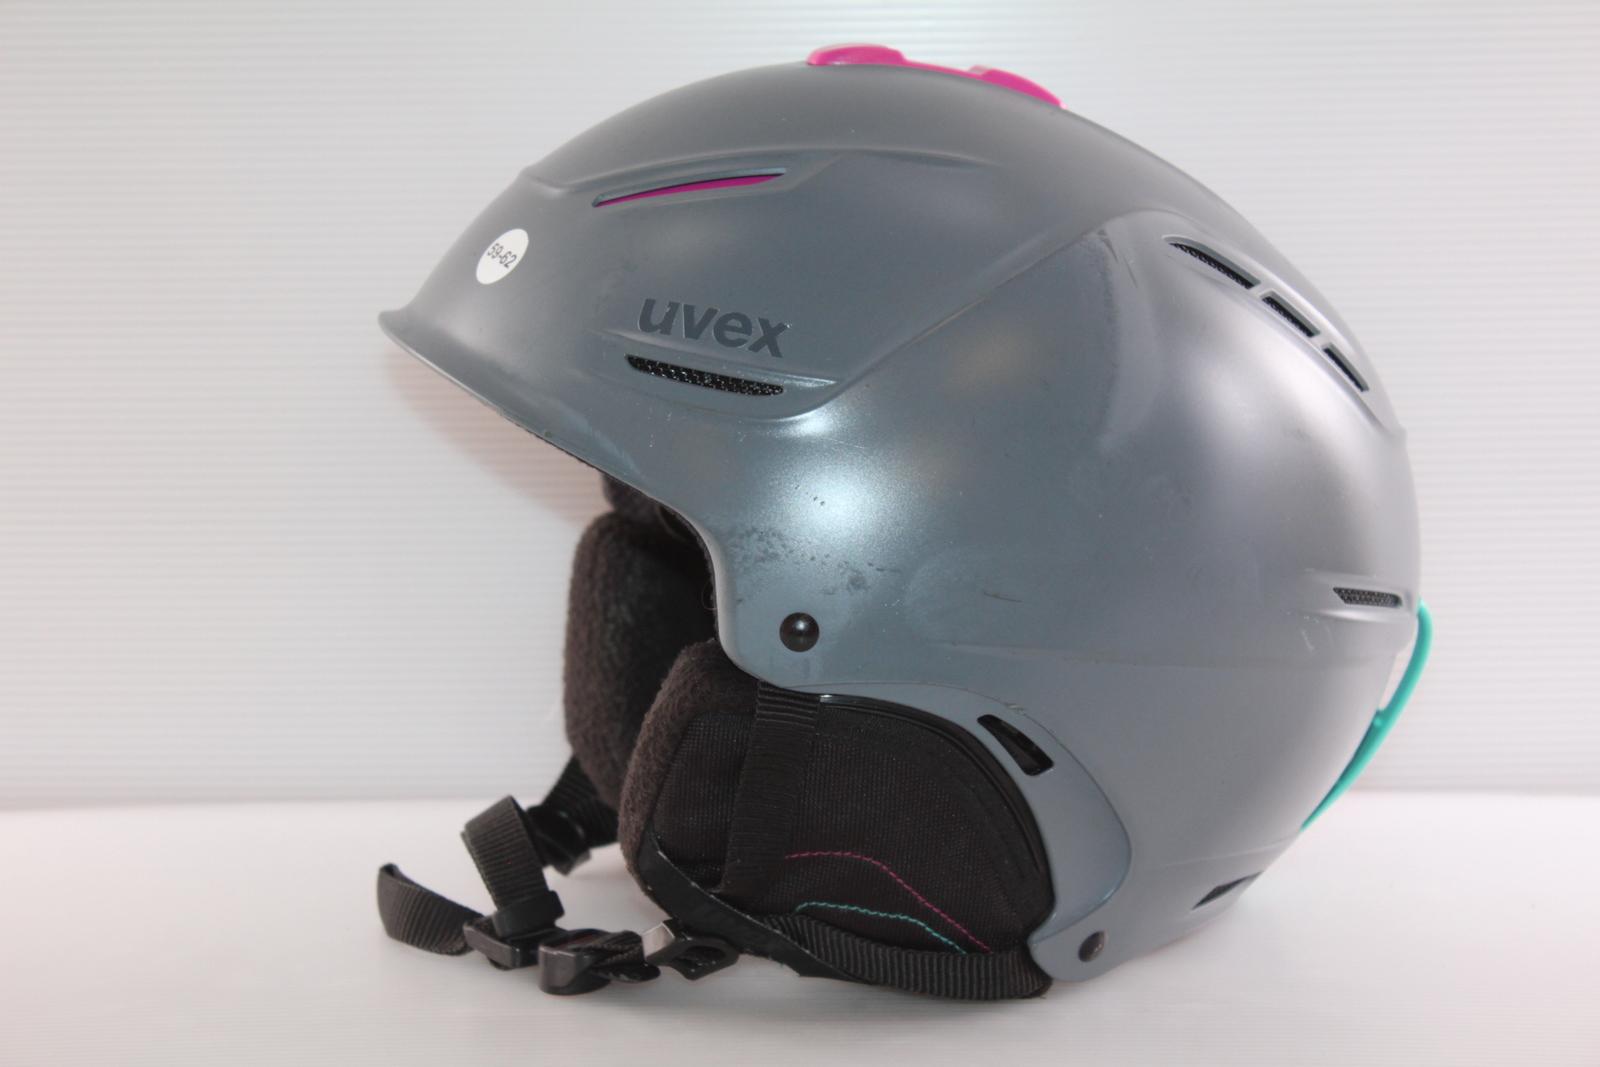 Dámská lyžařská helma Uvex  - posuvná vel. 59 - 62